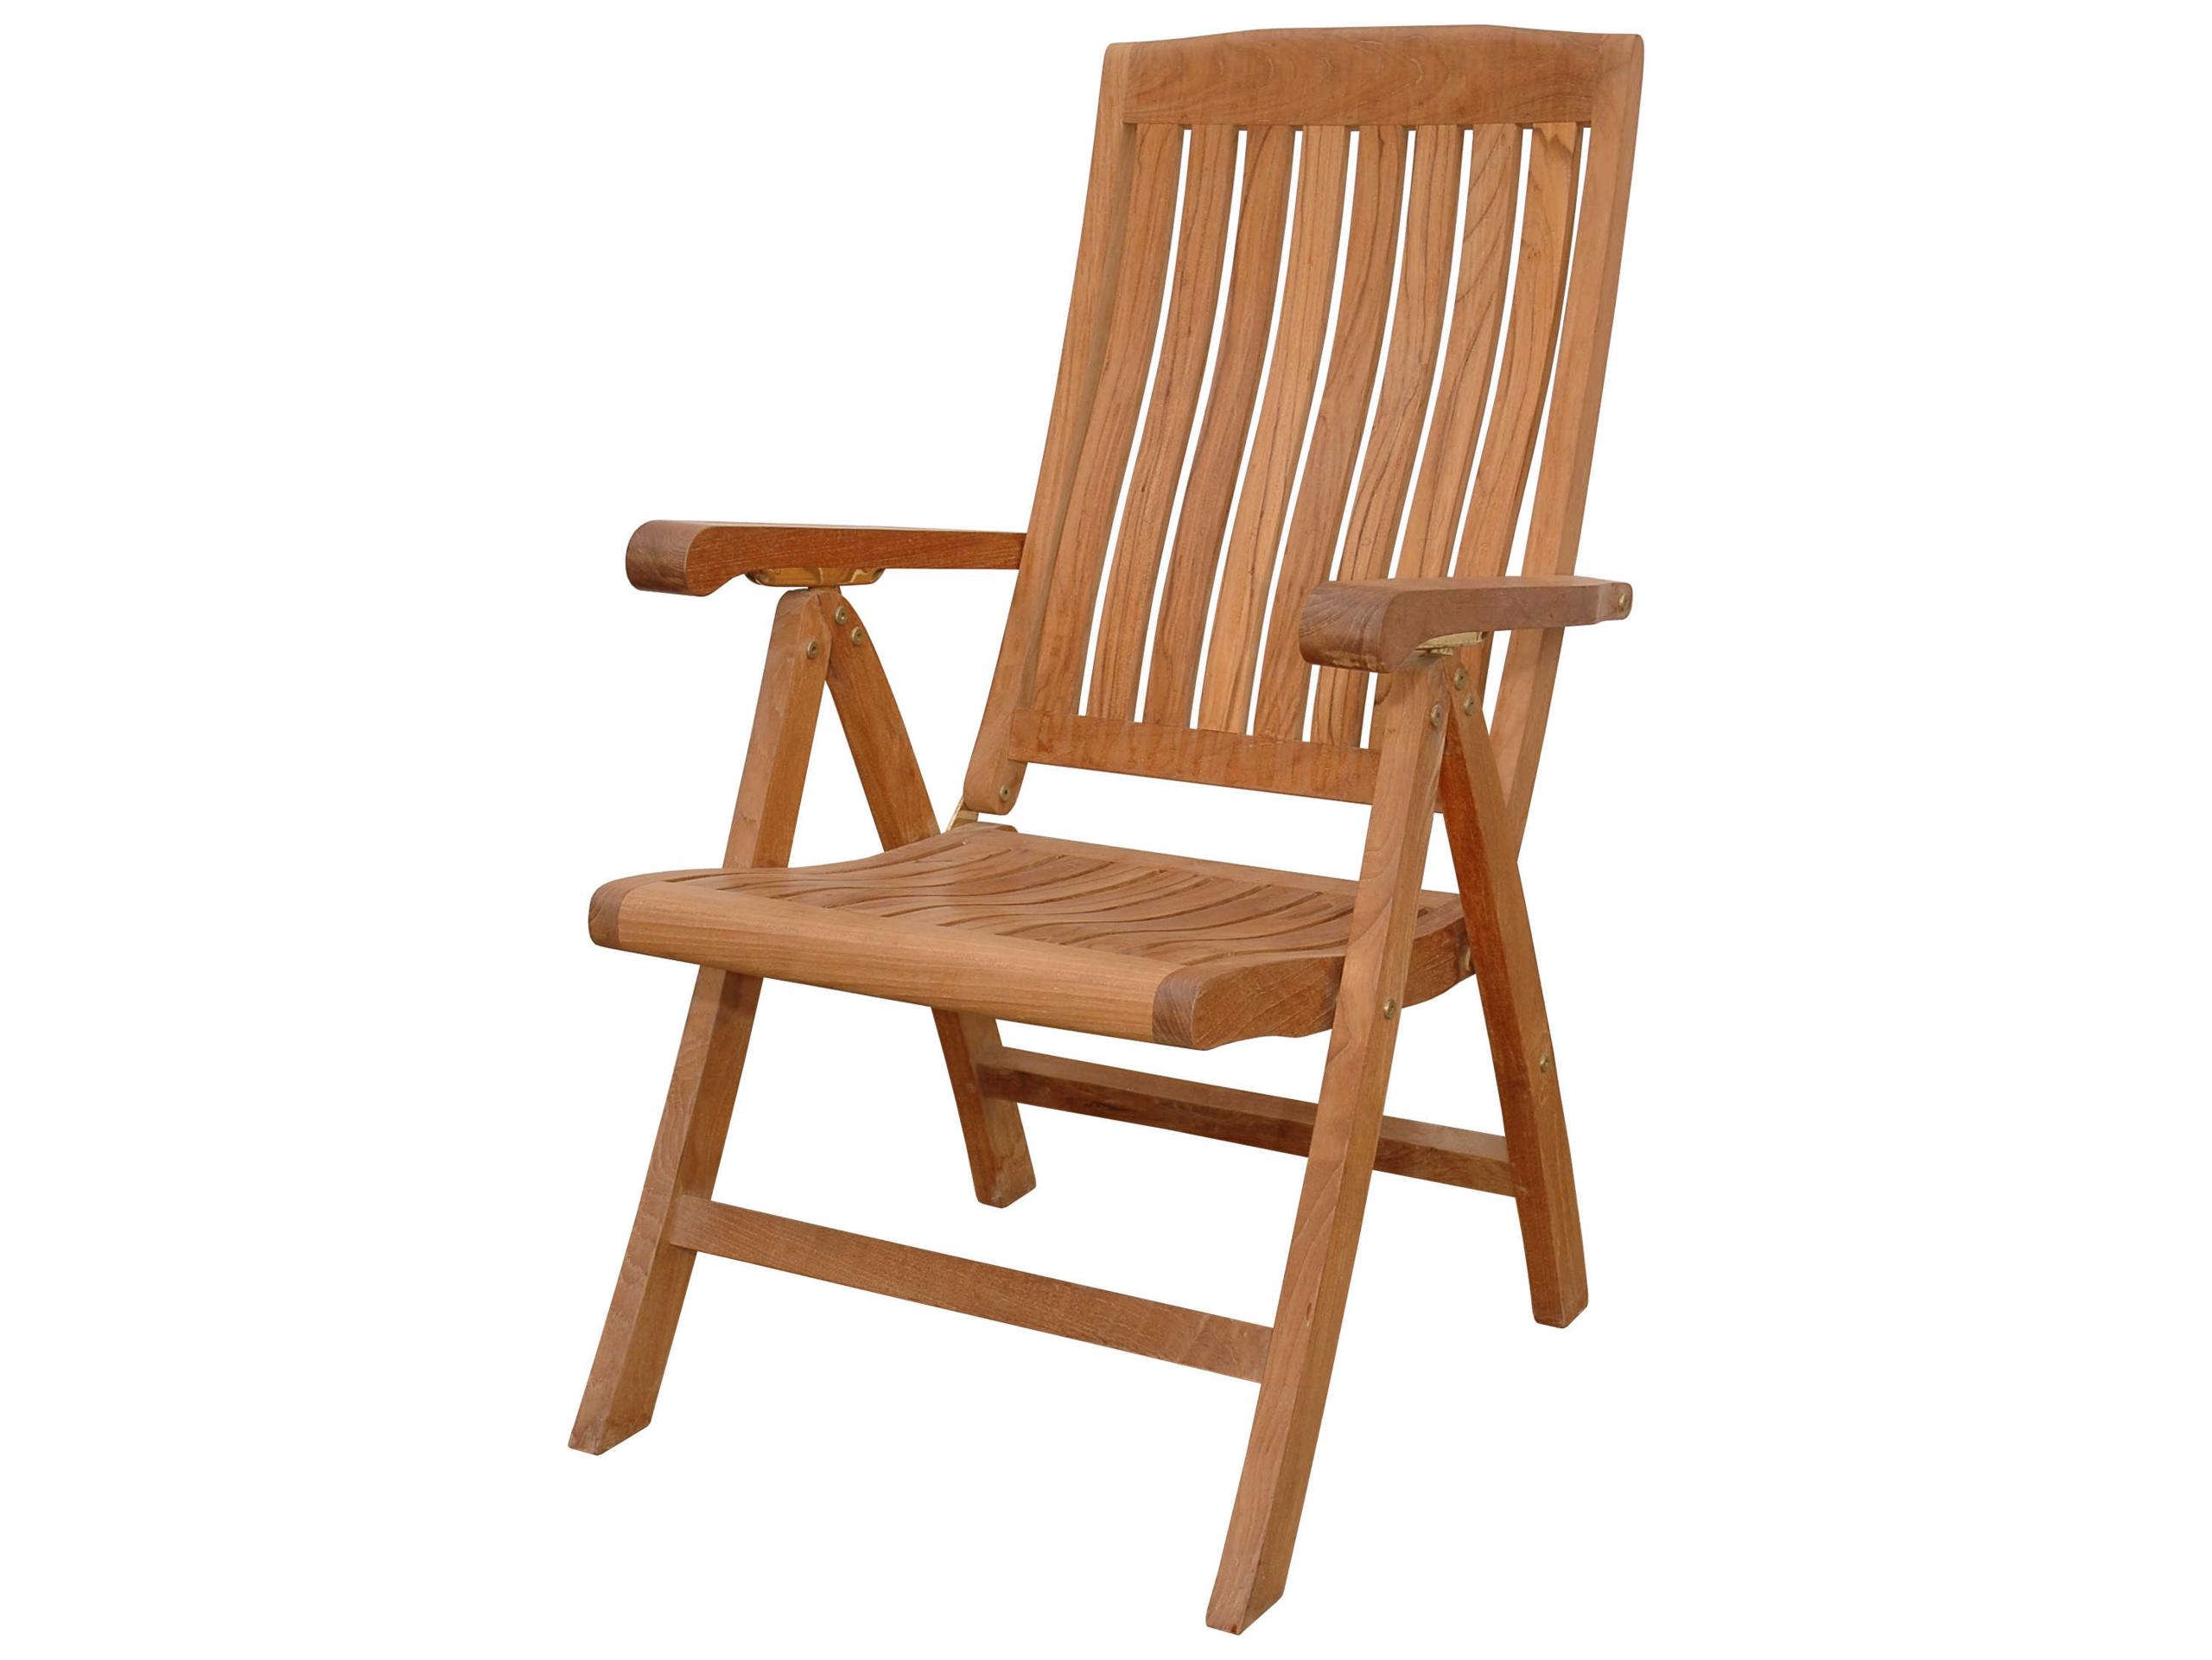 Marvelous Katana 5 Position Recliner Armchair By Anderson Teak MPN: CHR 120